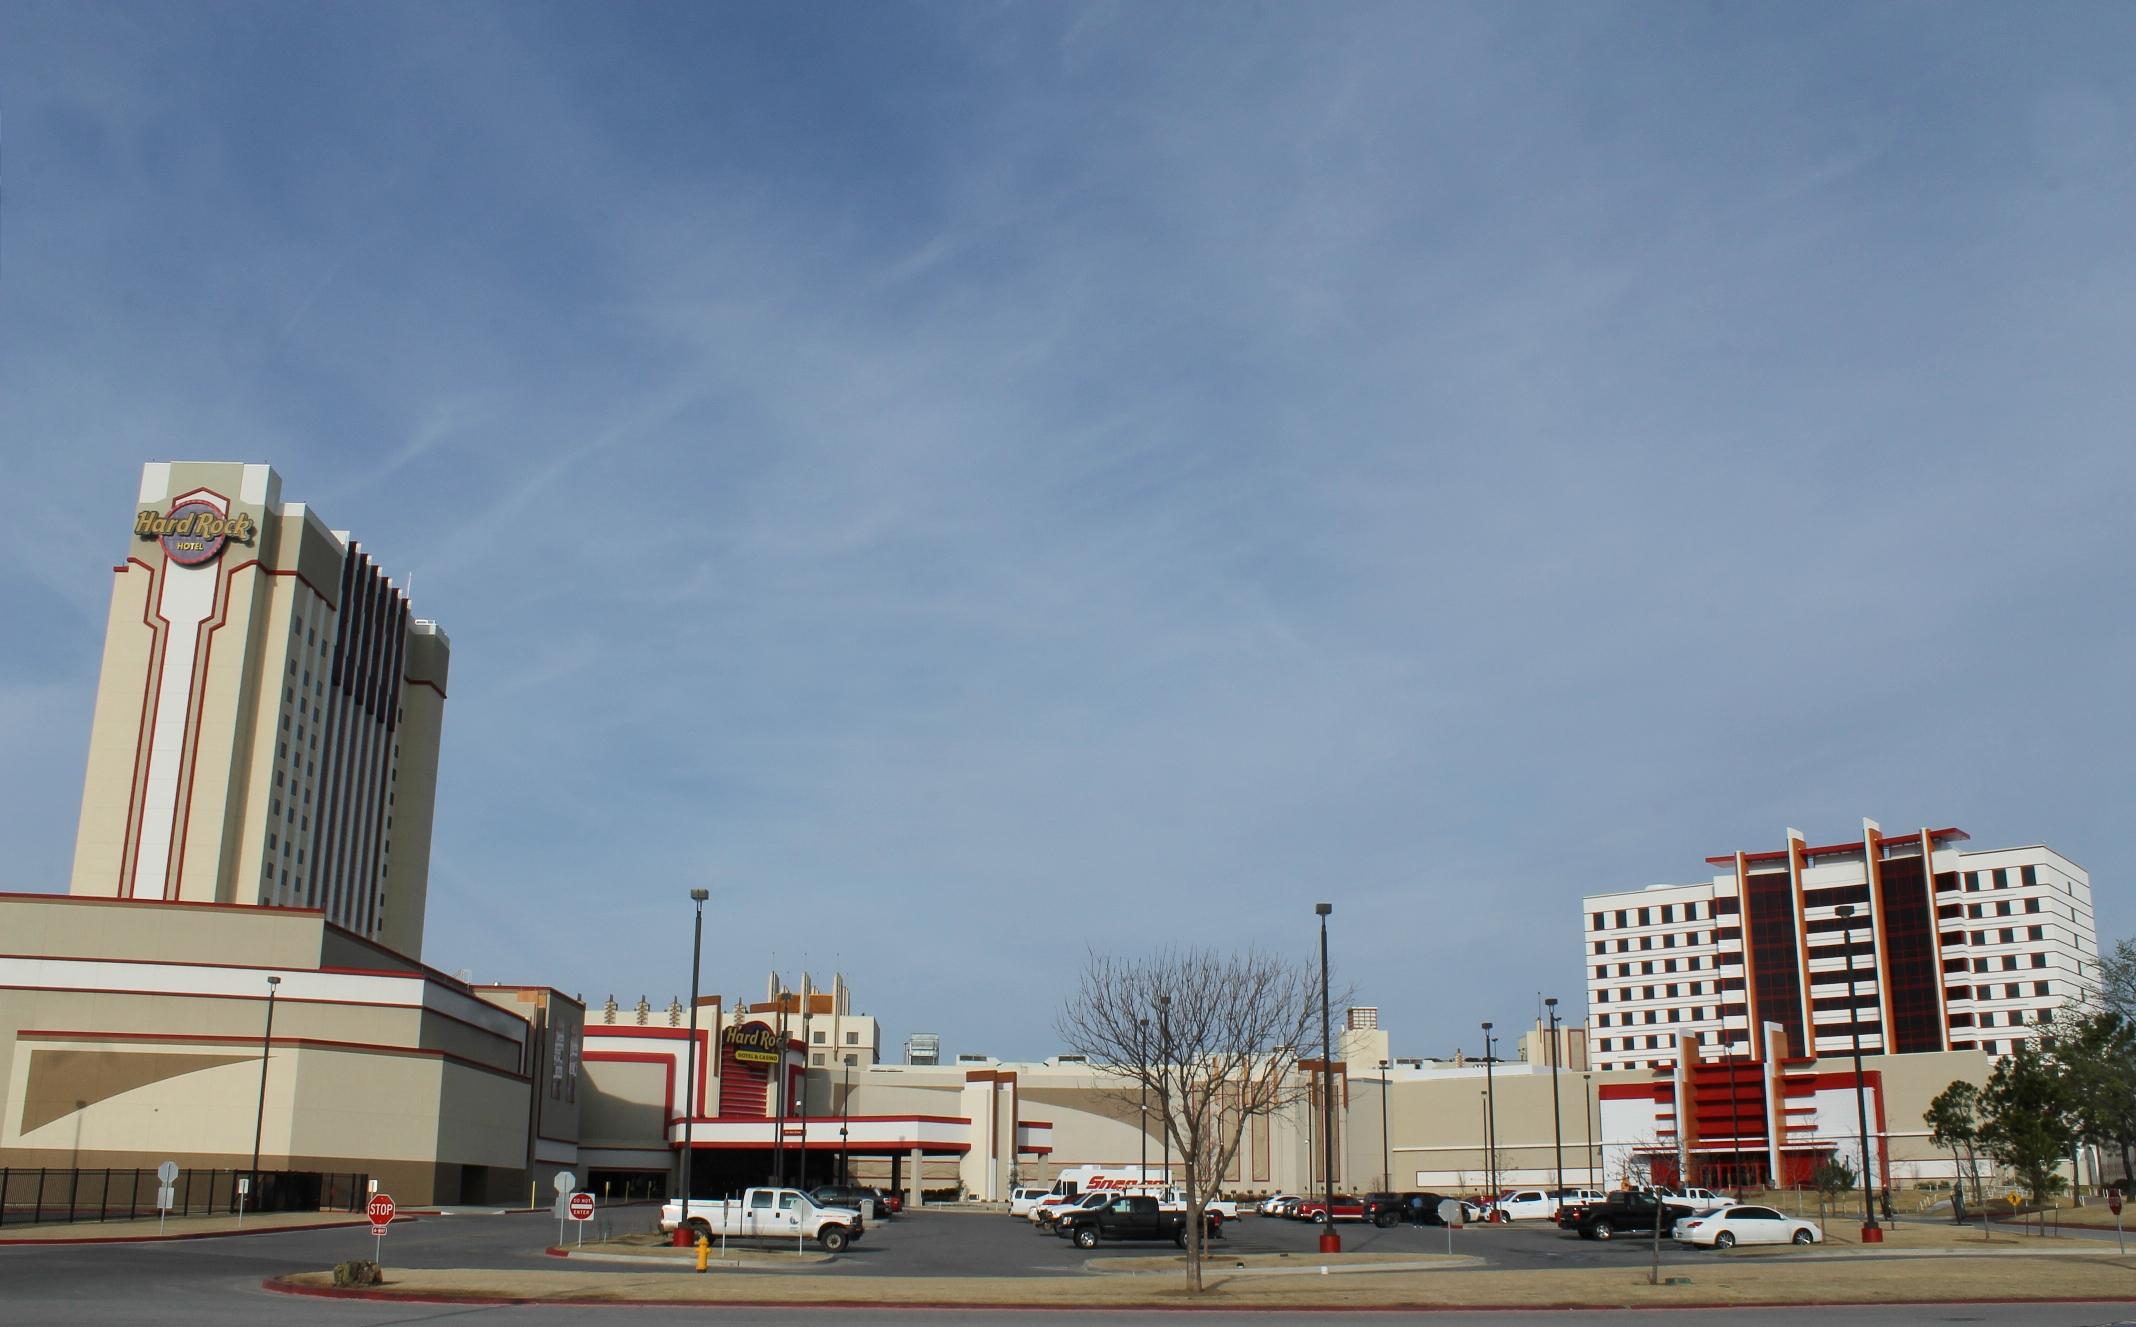 Tulsa hard rock casino age